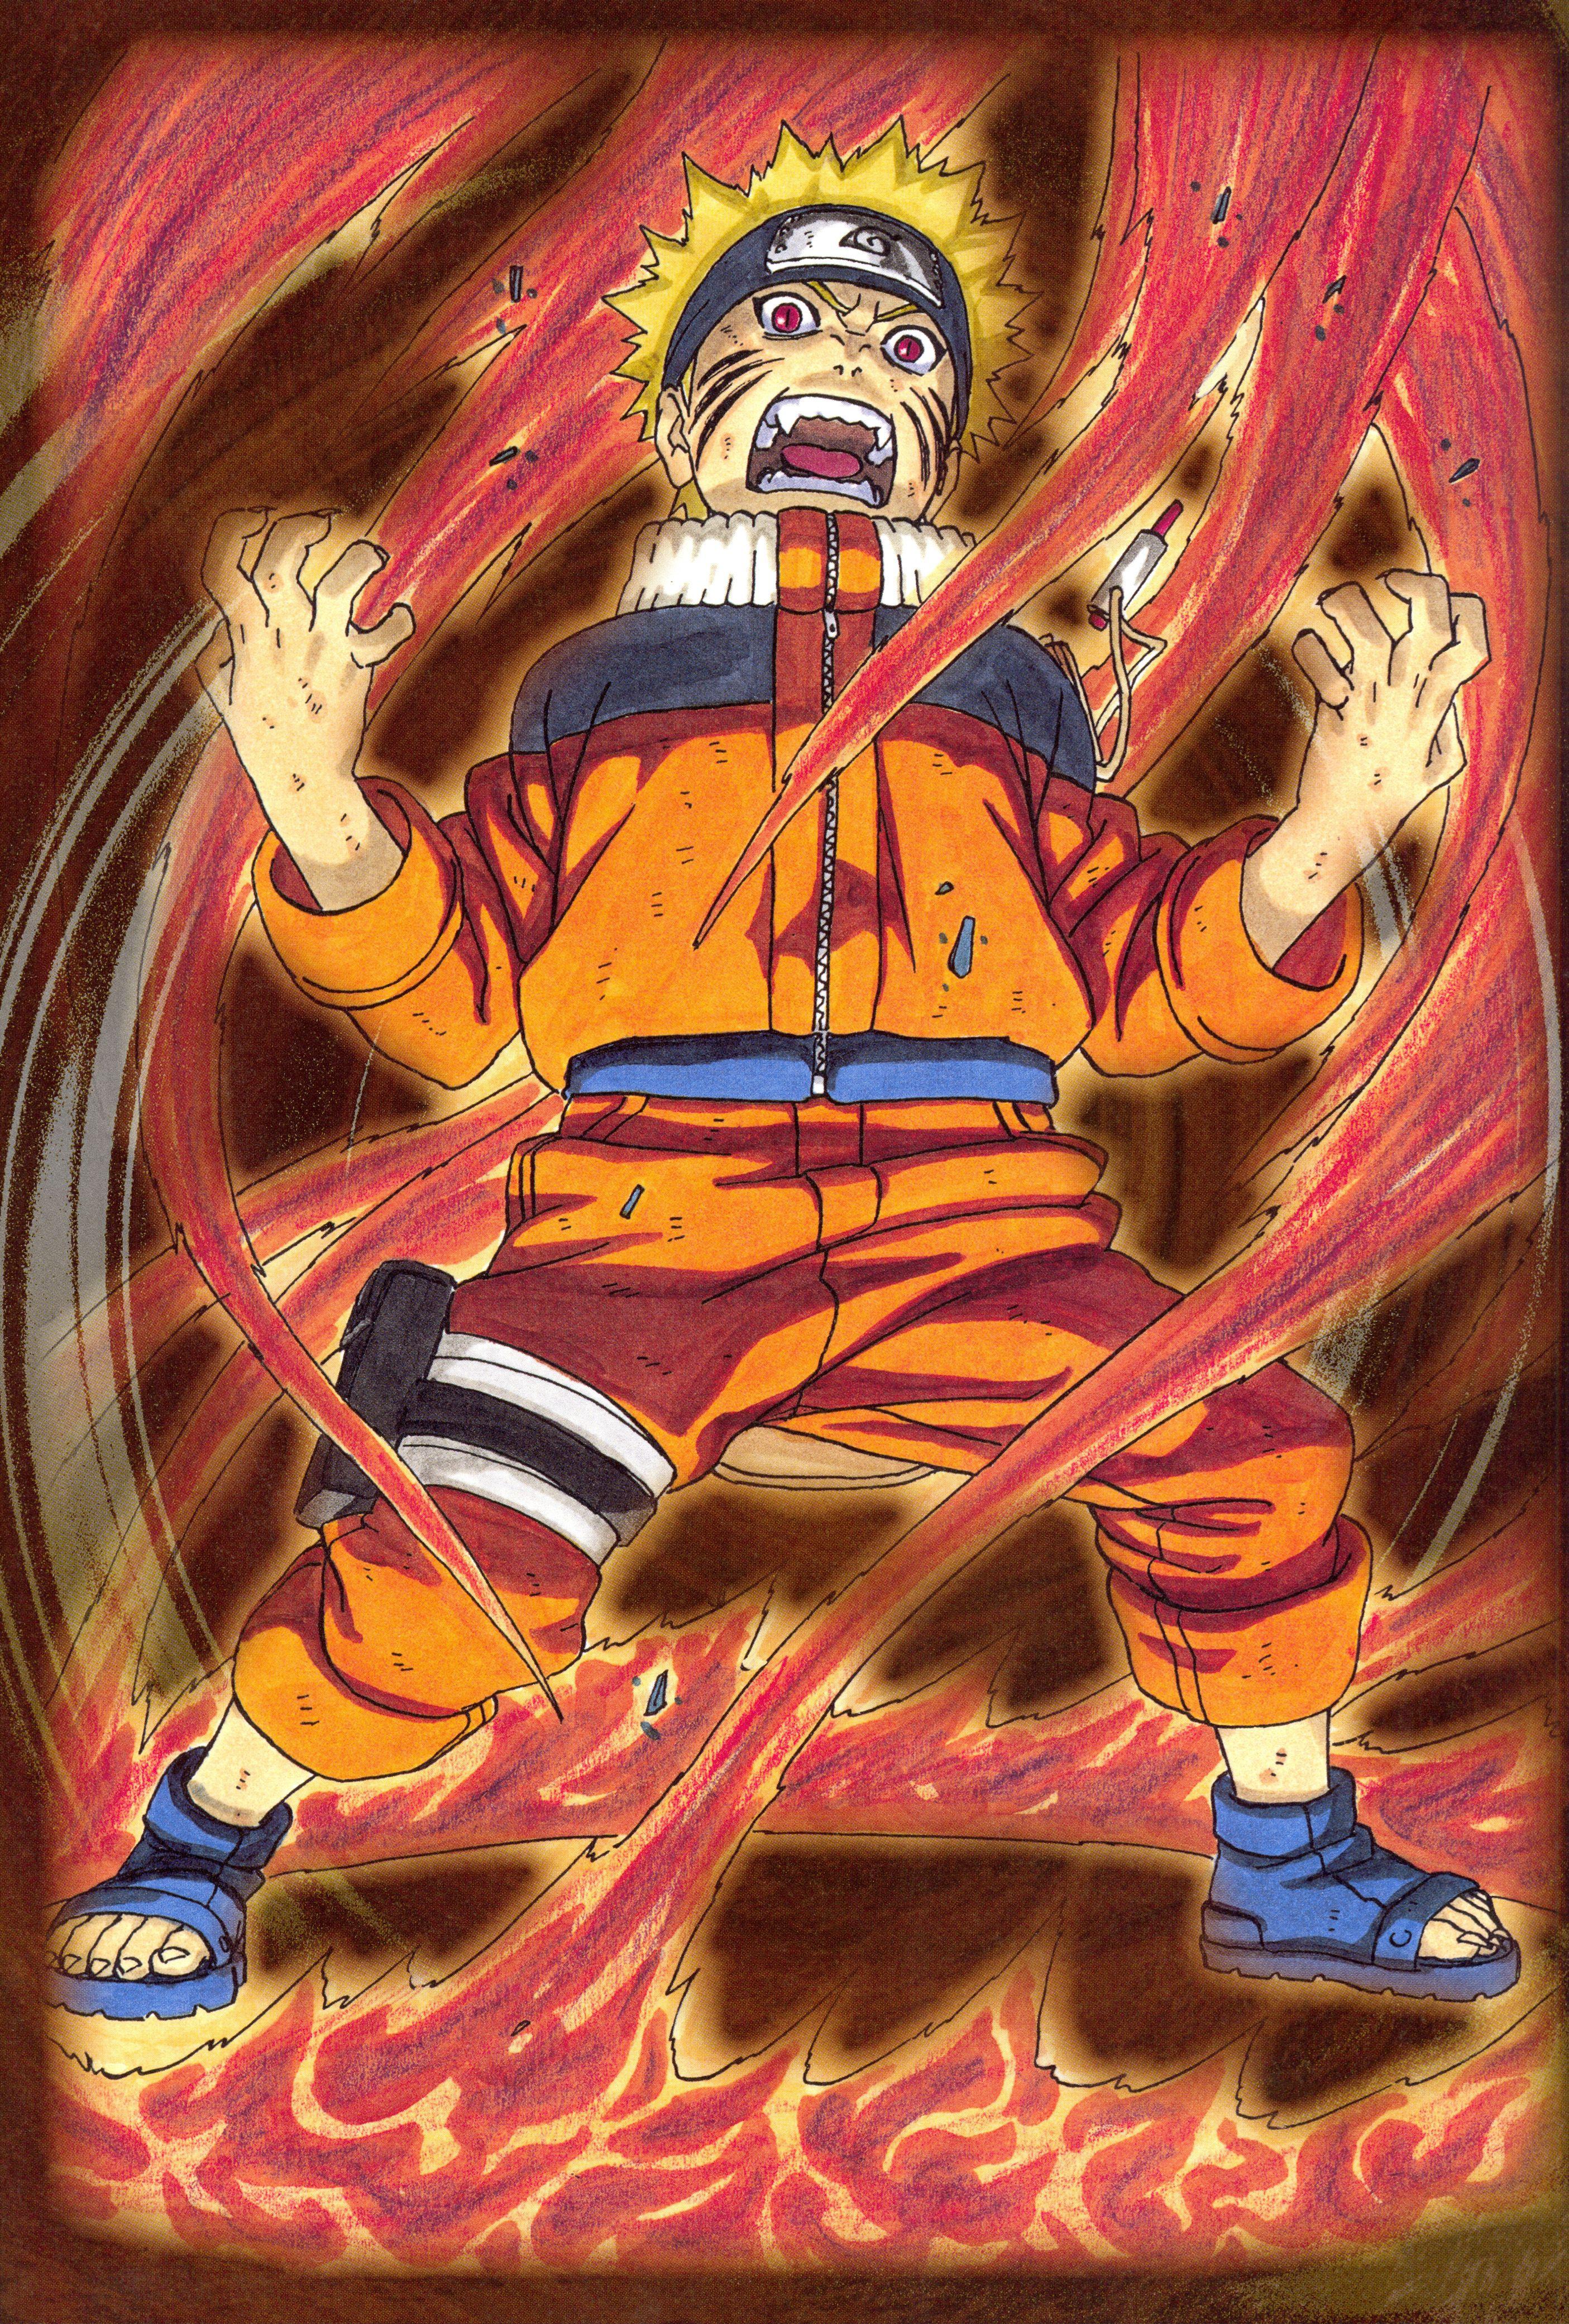 Naruto Mode Bijuu Wallpapers - Wallpaper Cave  Naruto Bijuu Mode Wallpapers Hd